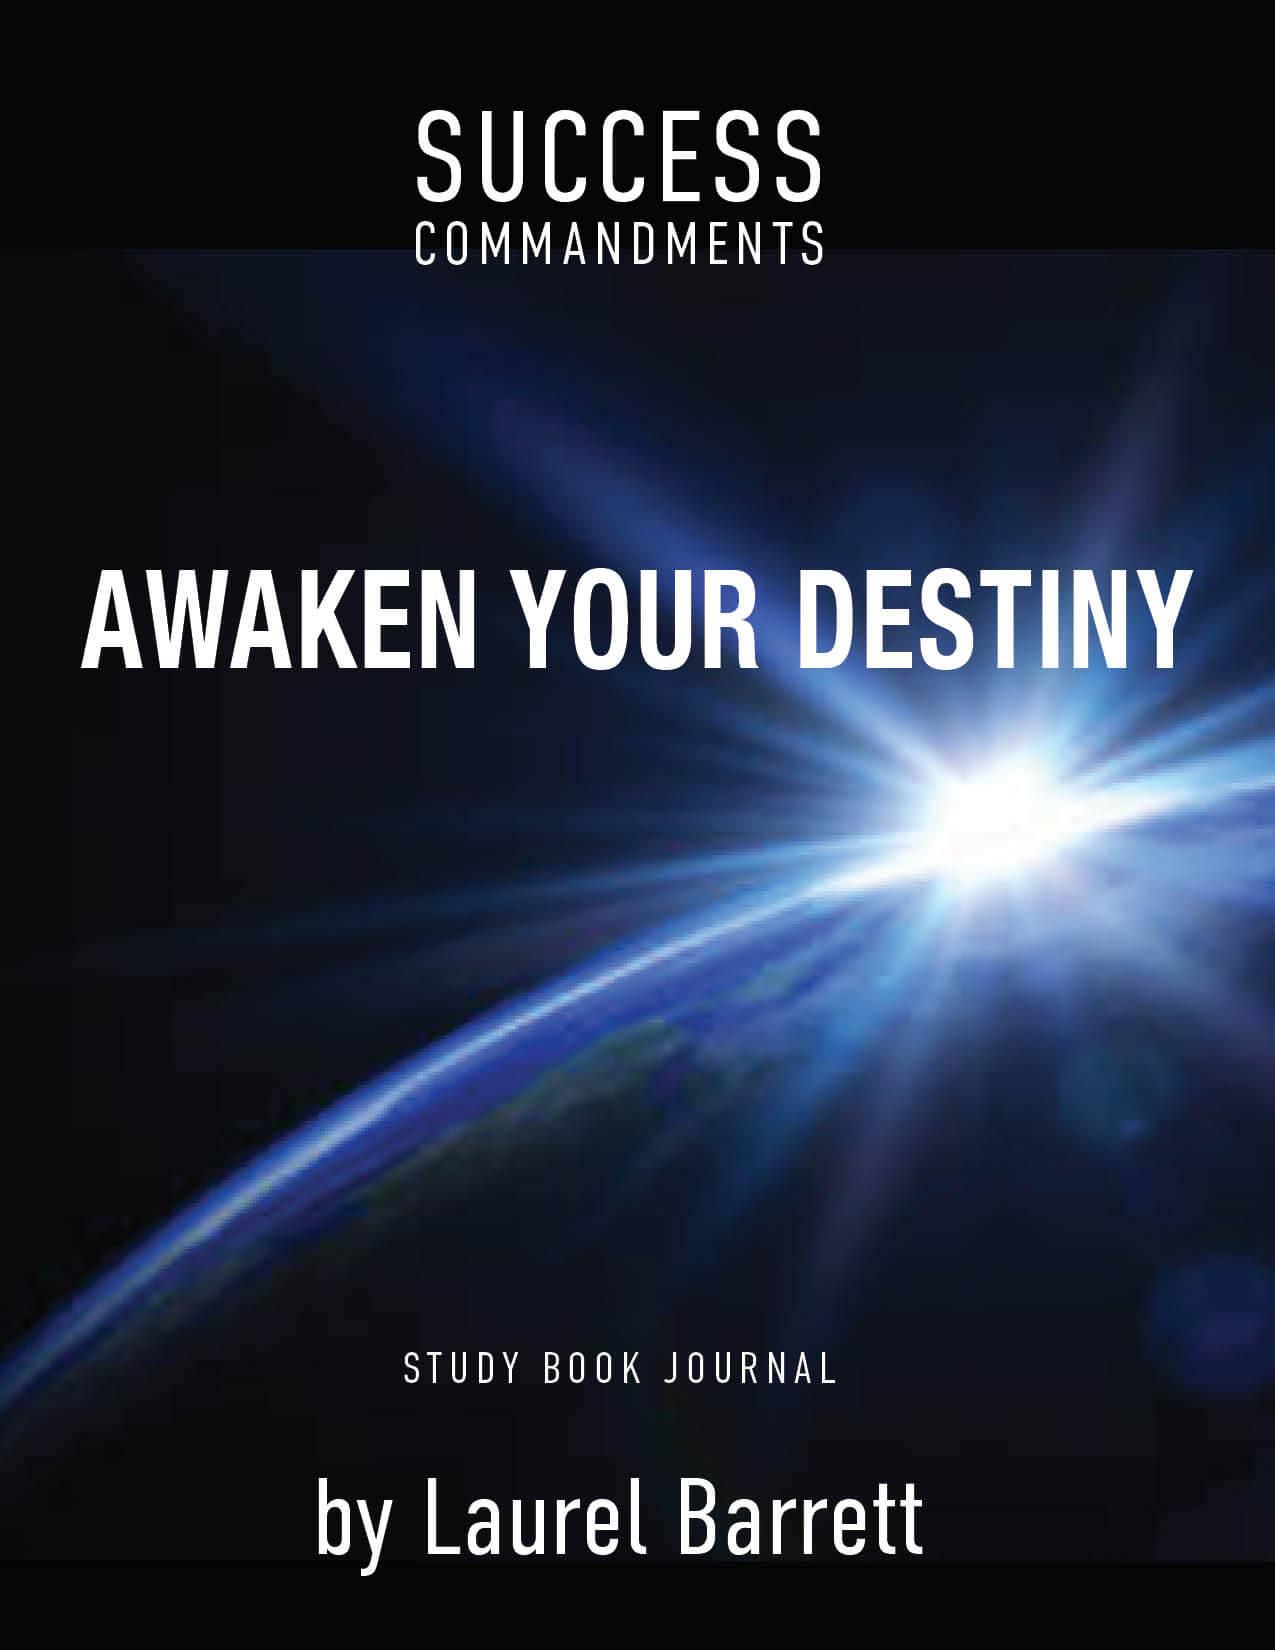 SUCCESS COMMANDMENTS: AWAKEN YOUR DESTINY BOOK. STUDY JOURNAL